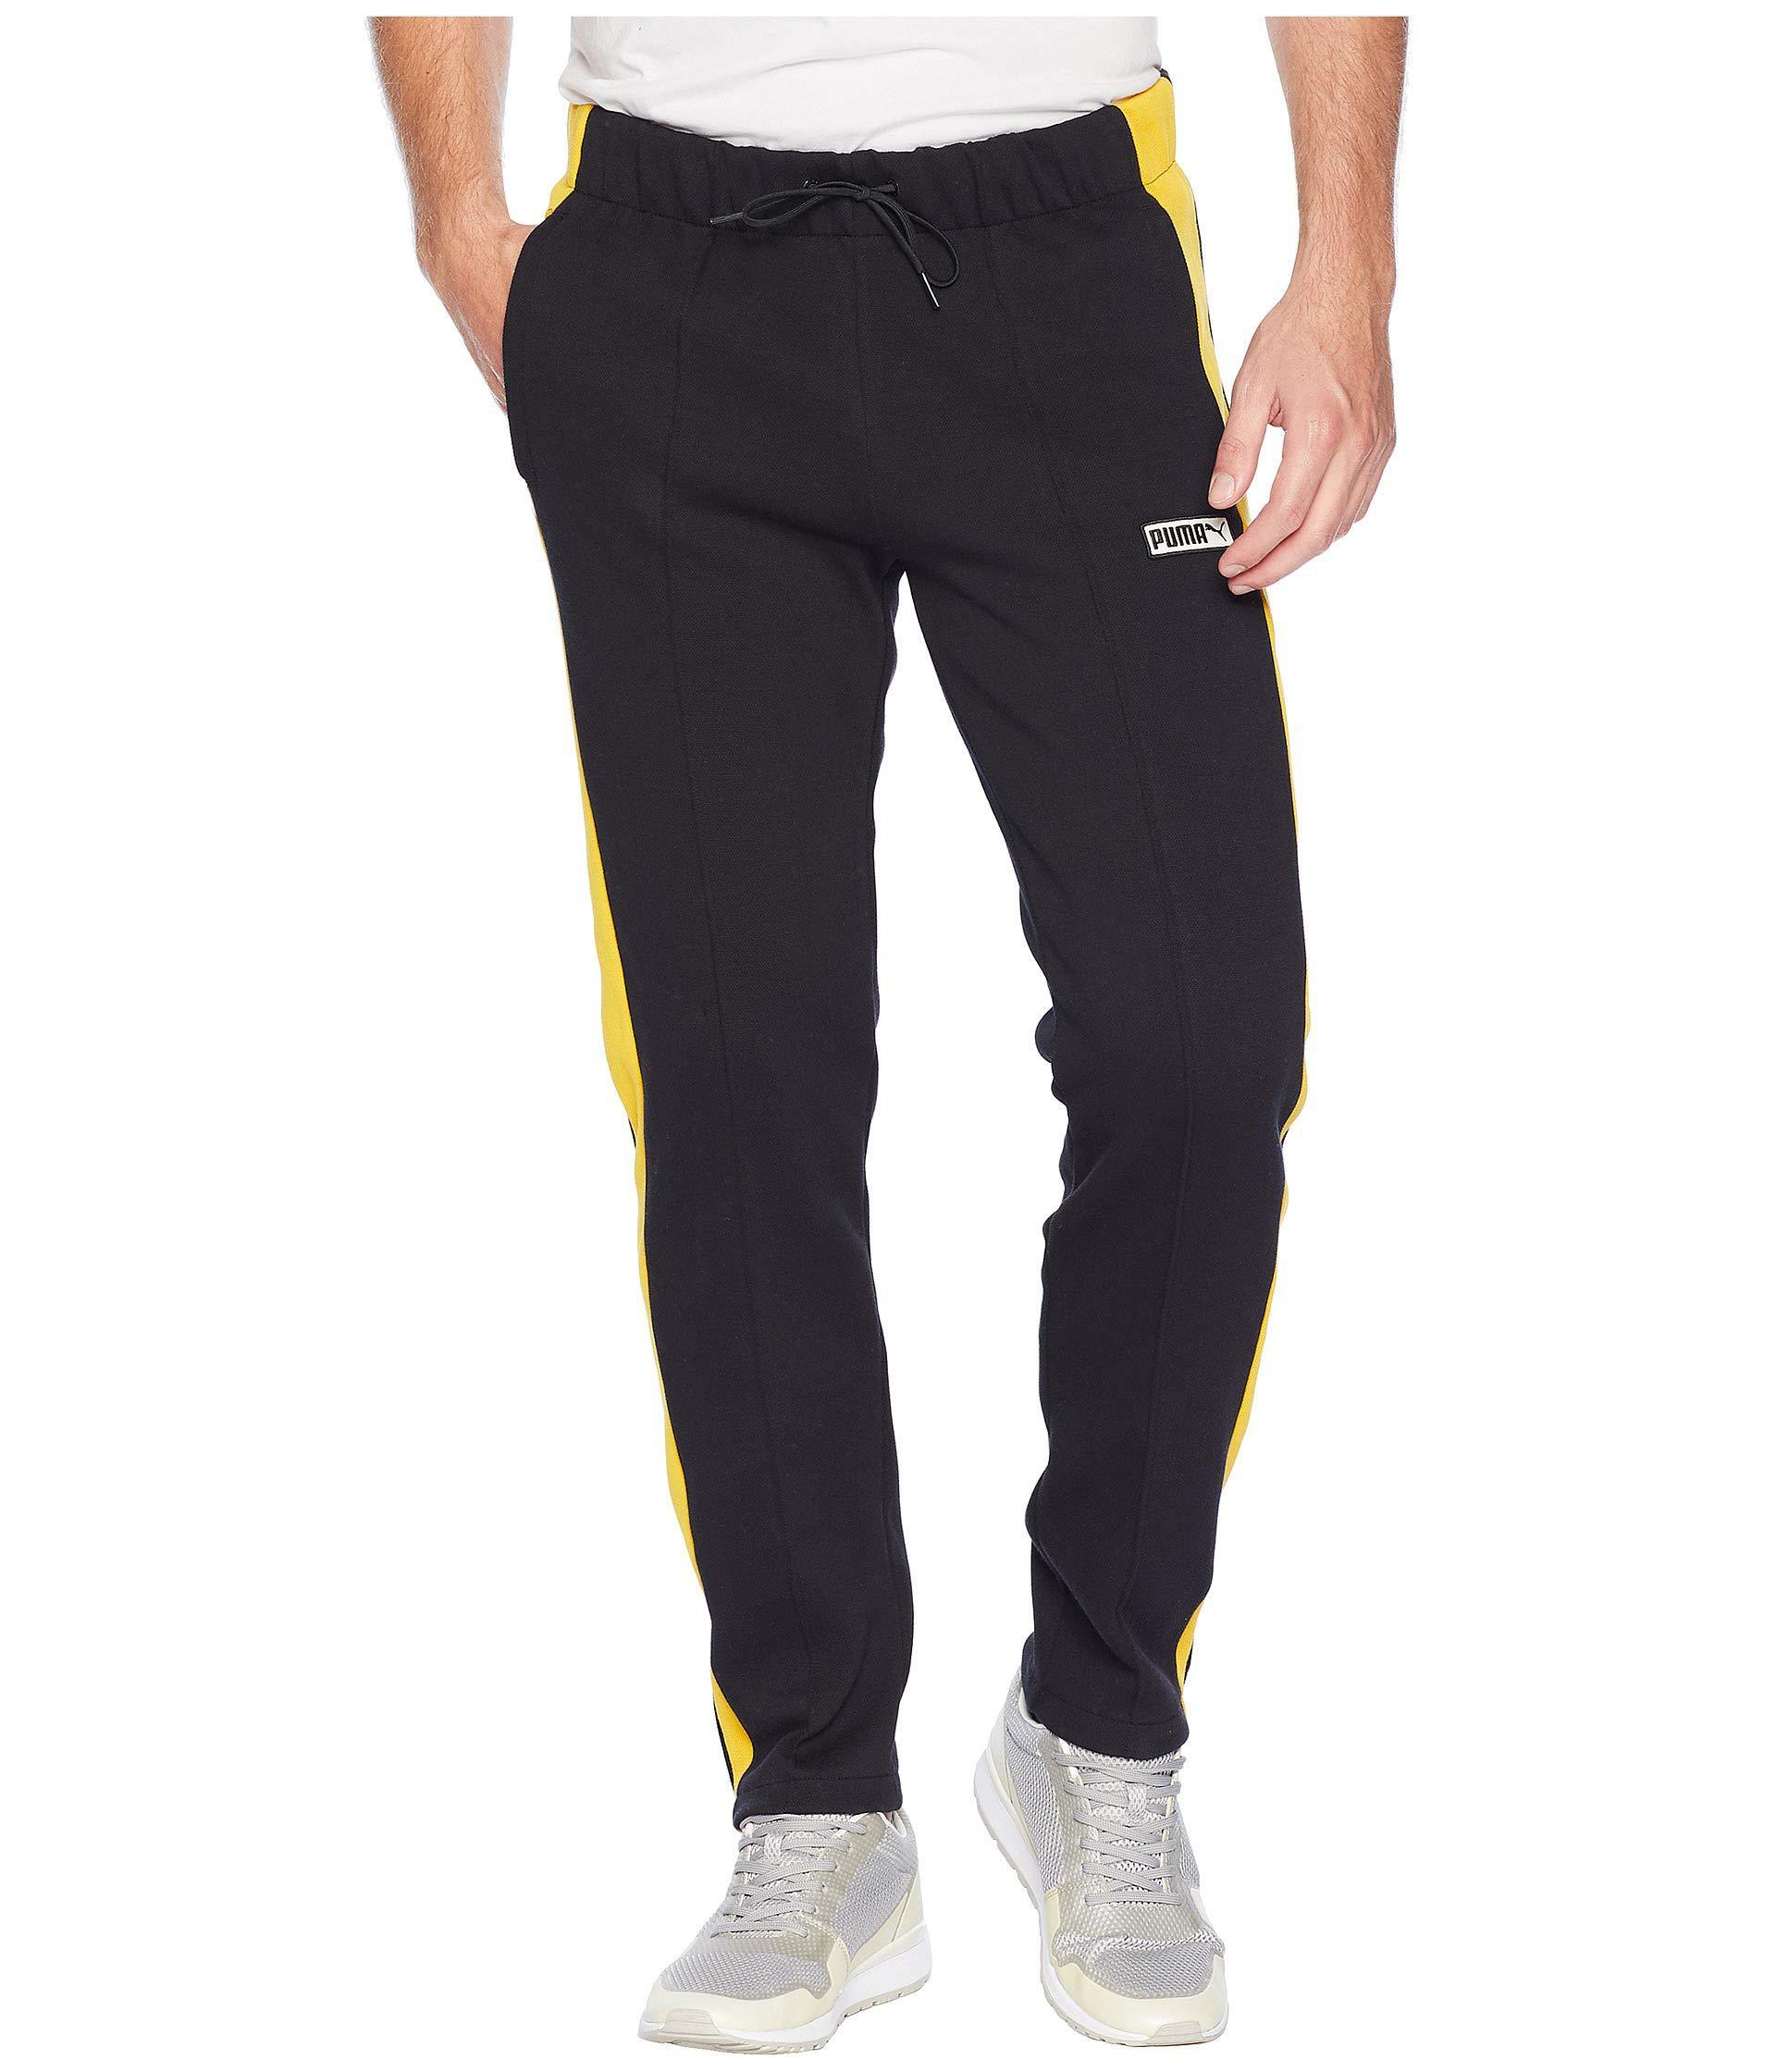 c4636b9e0c55 Lyst - PUMA Spezial T7 Track Pants in Black for Men - Save 49%